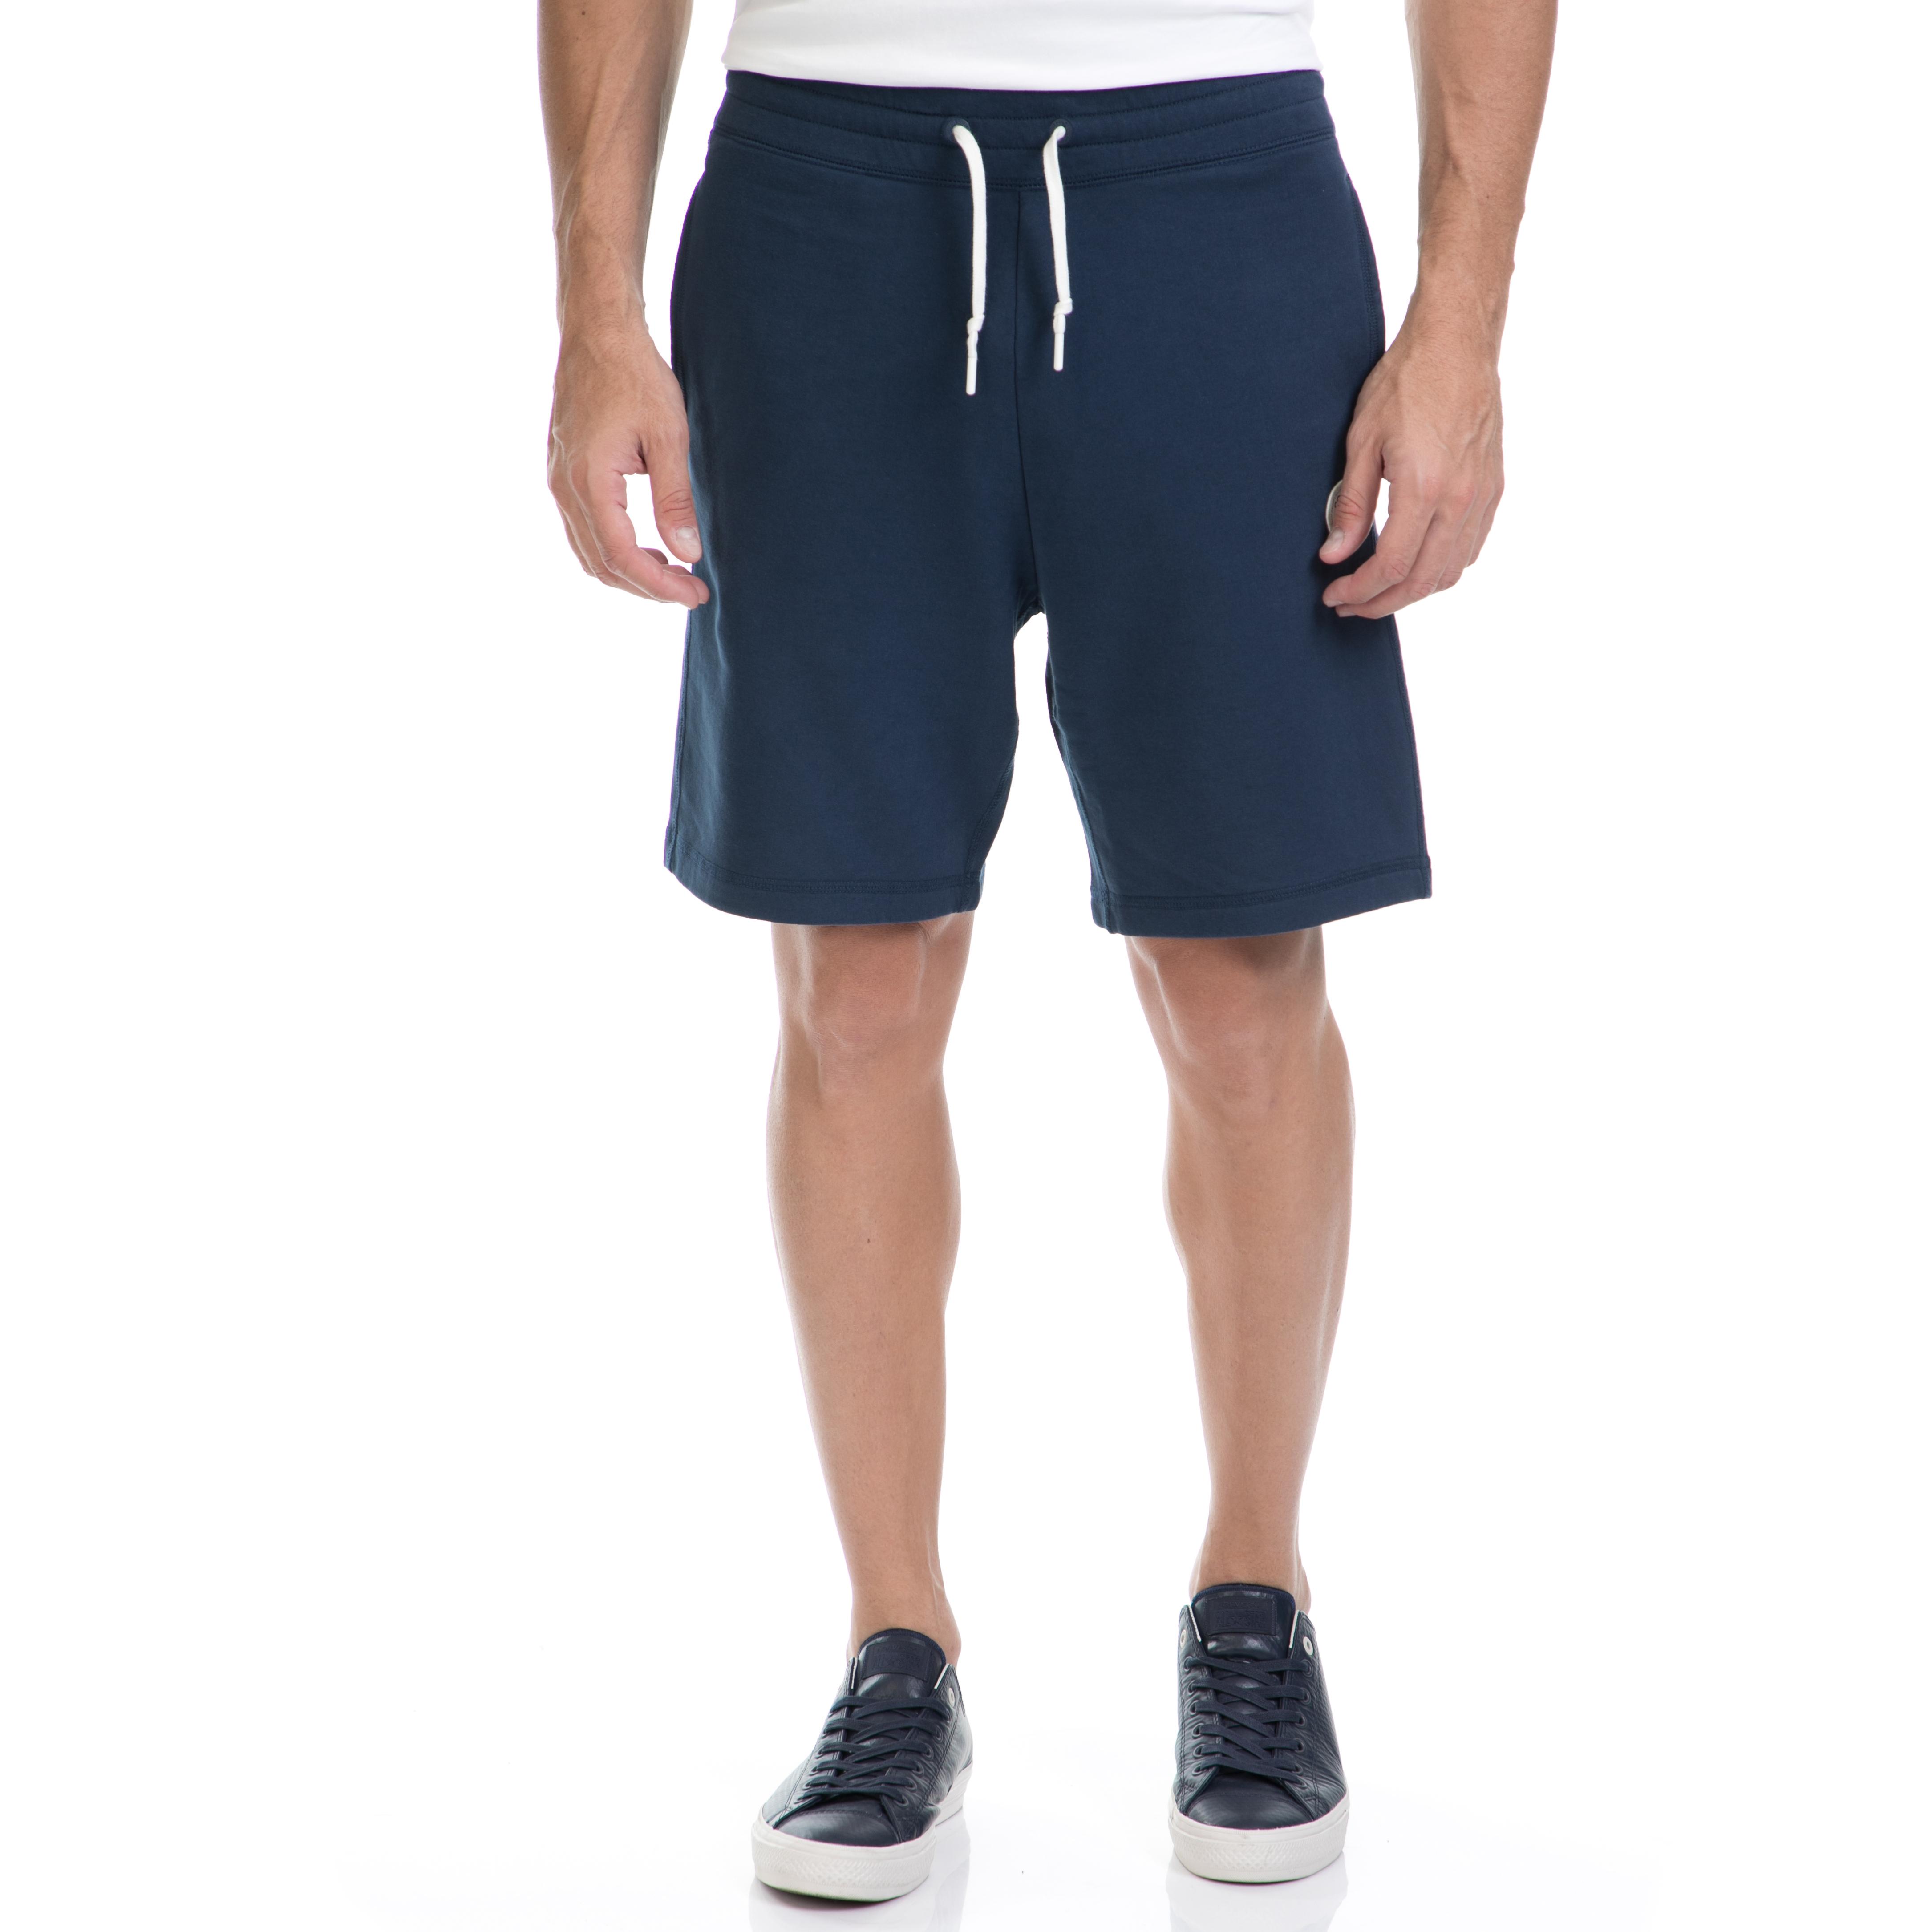 CONVERSE - Αντρική βερμούδα CONVERSE μπλε ανδρικά ρούχα σορτς βερμούδες αθλητικά